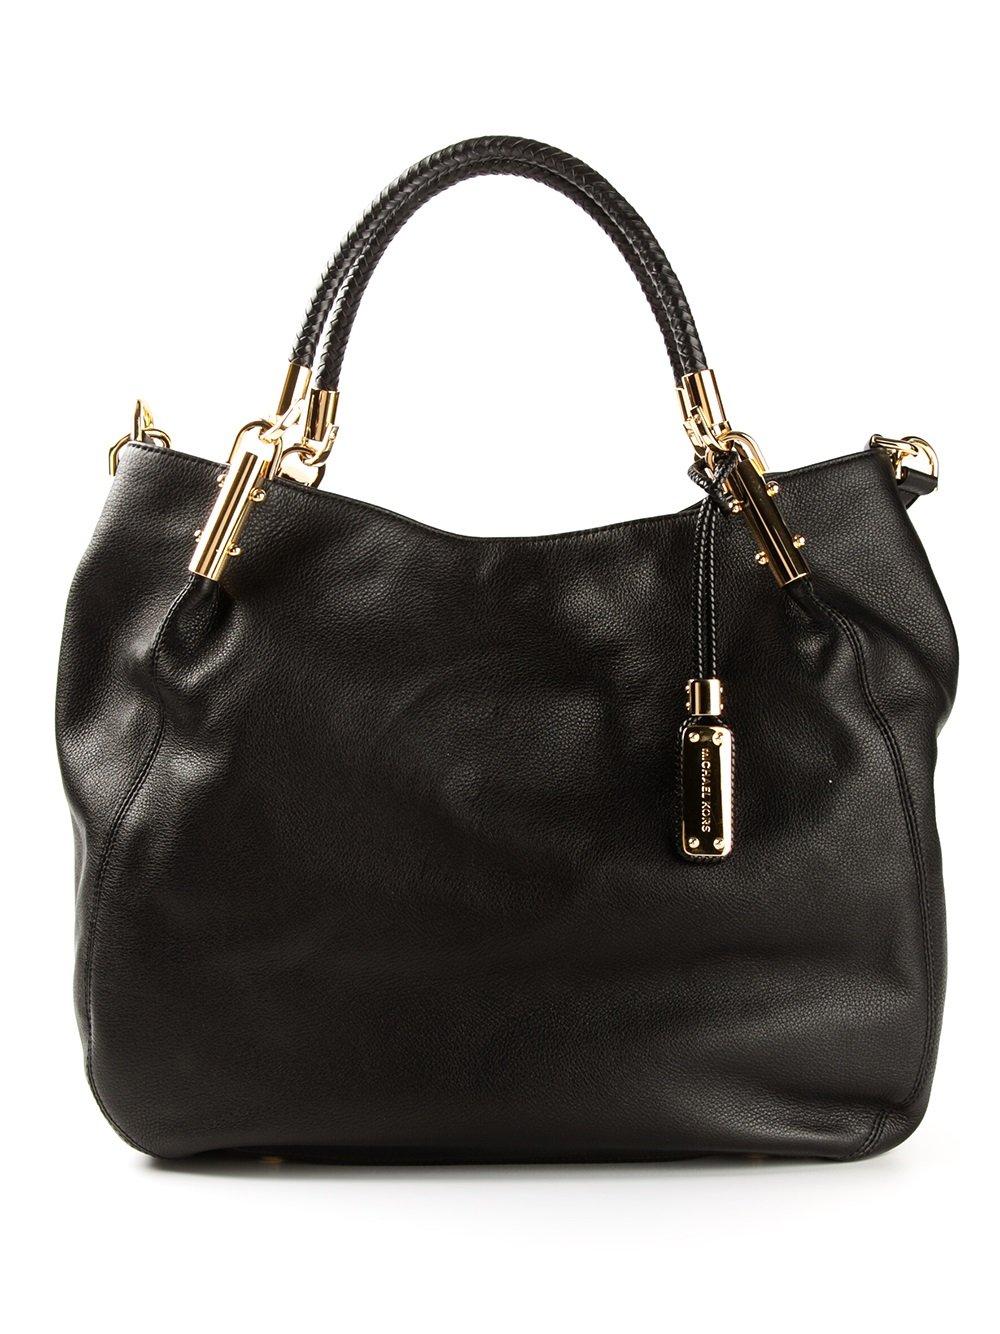 Lyst Michael Kors Large Skorpios Shoulder Bag In Black